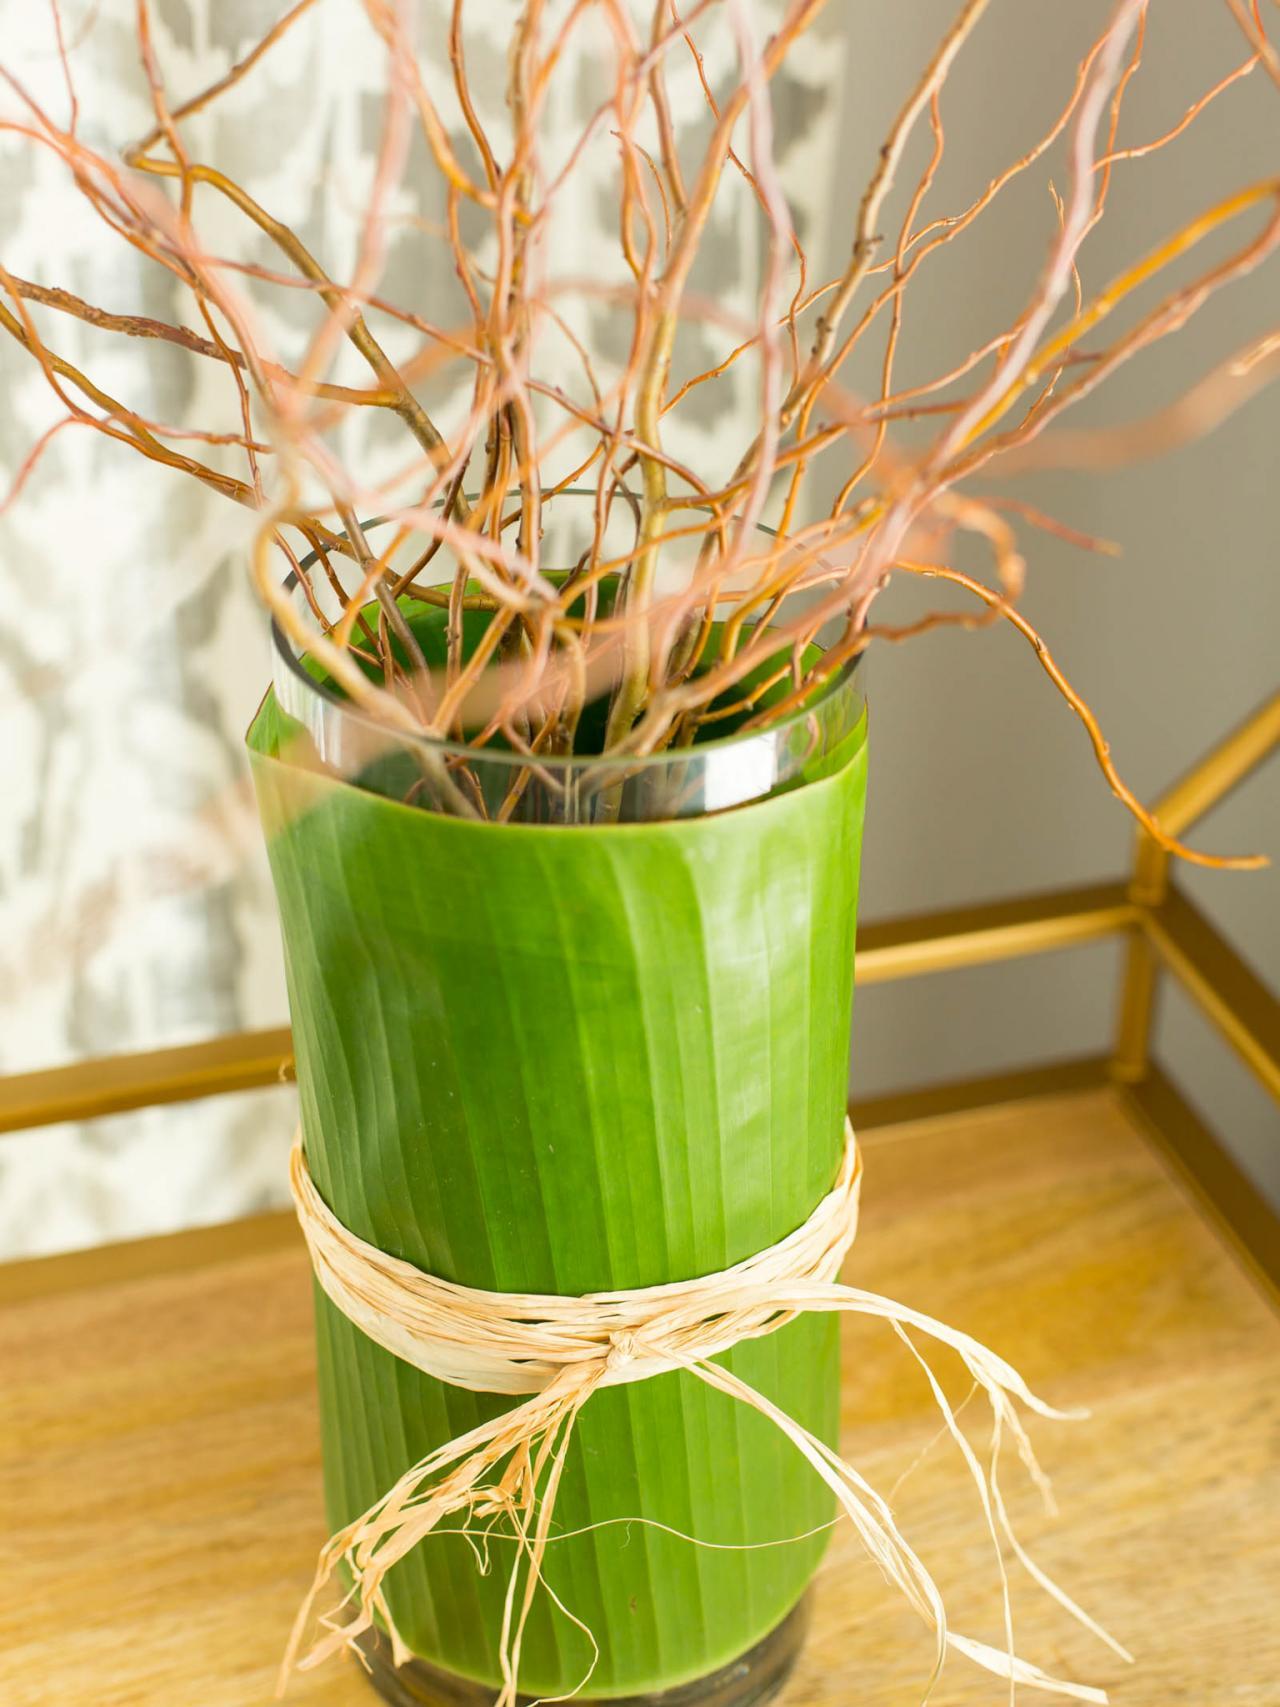 how to decorate a glass vase 1 hgtv. Black Bedroom Furniture Sets. Home Design Ideas